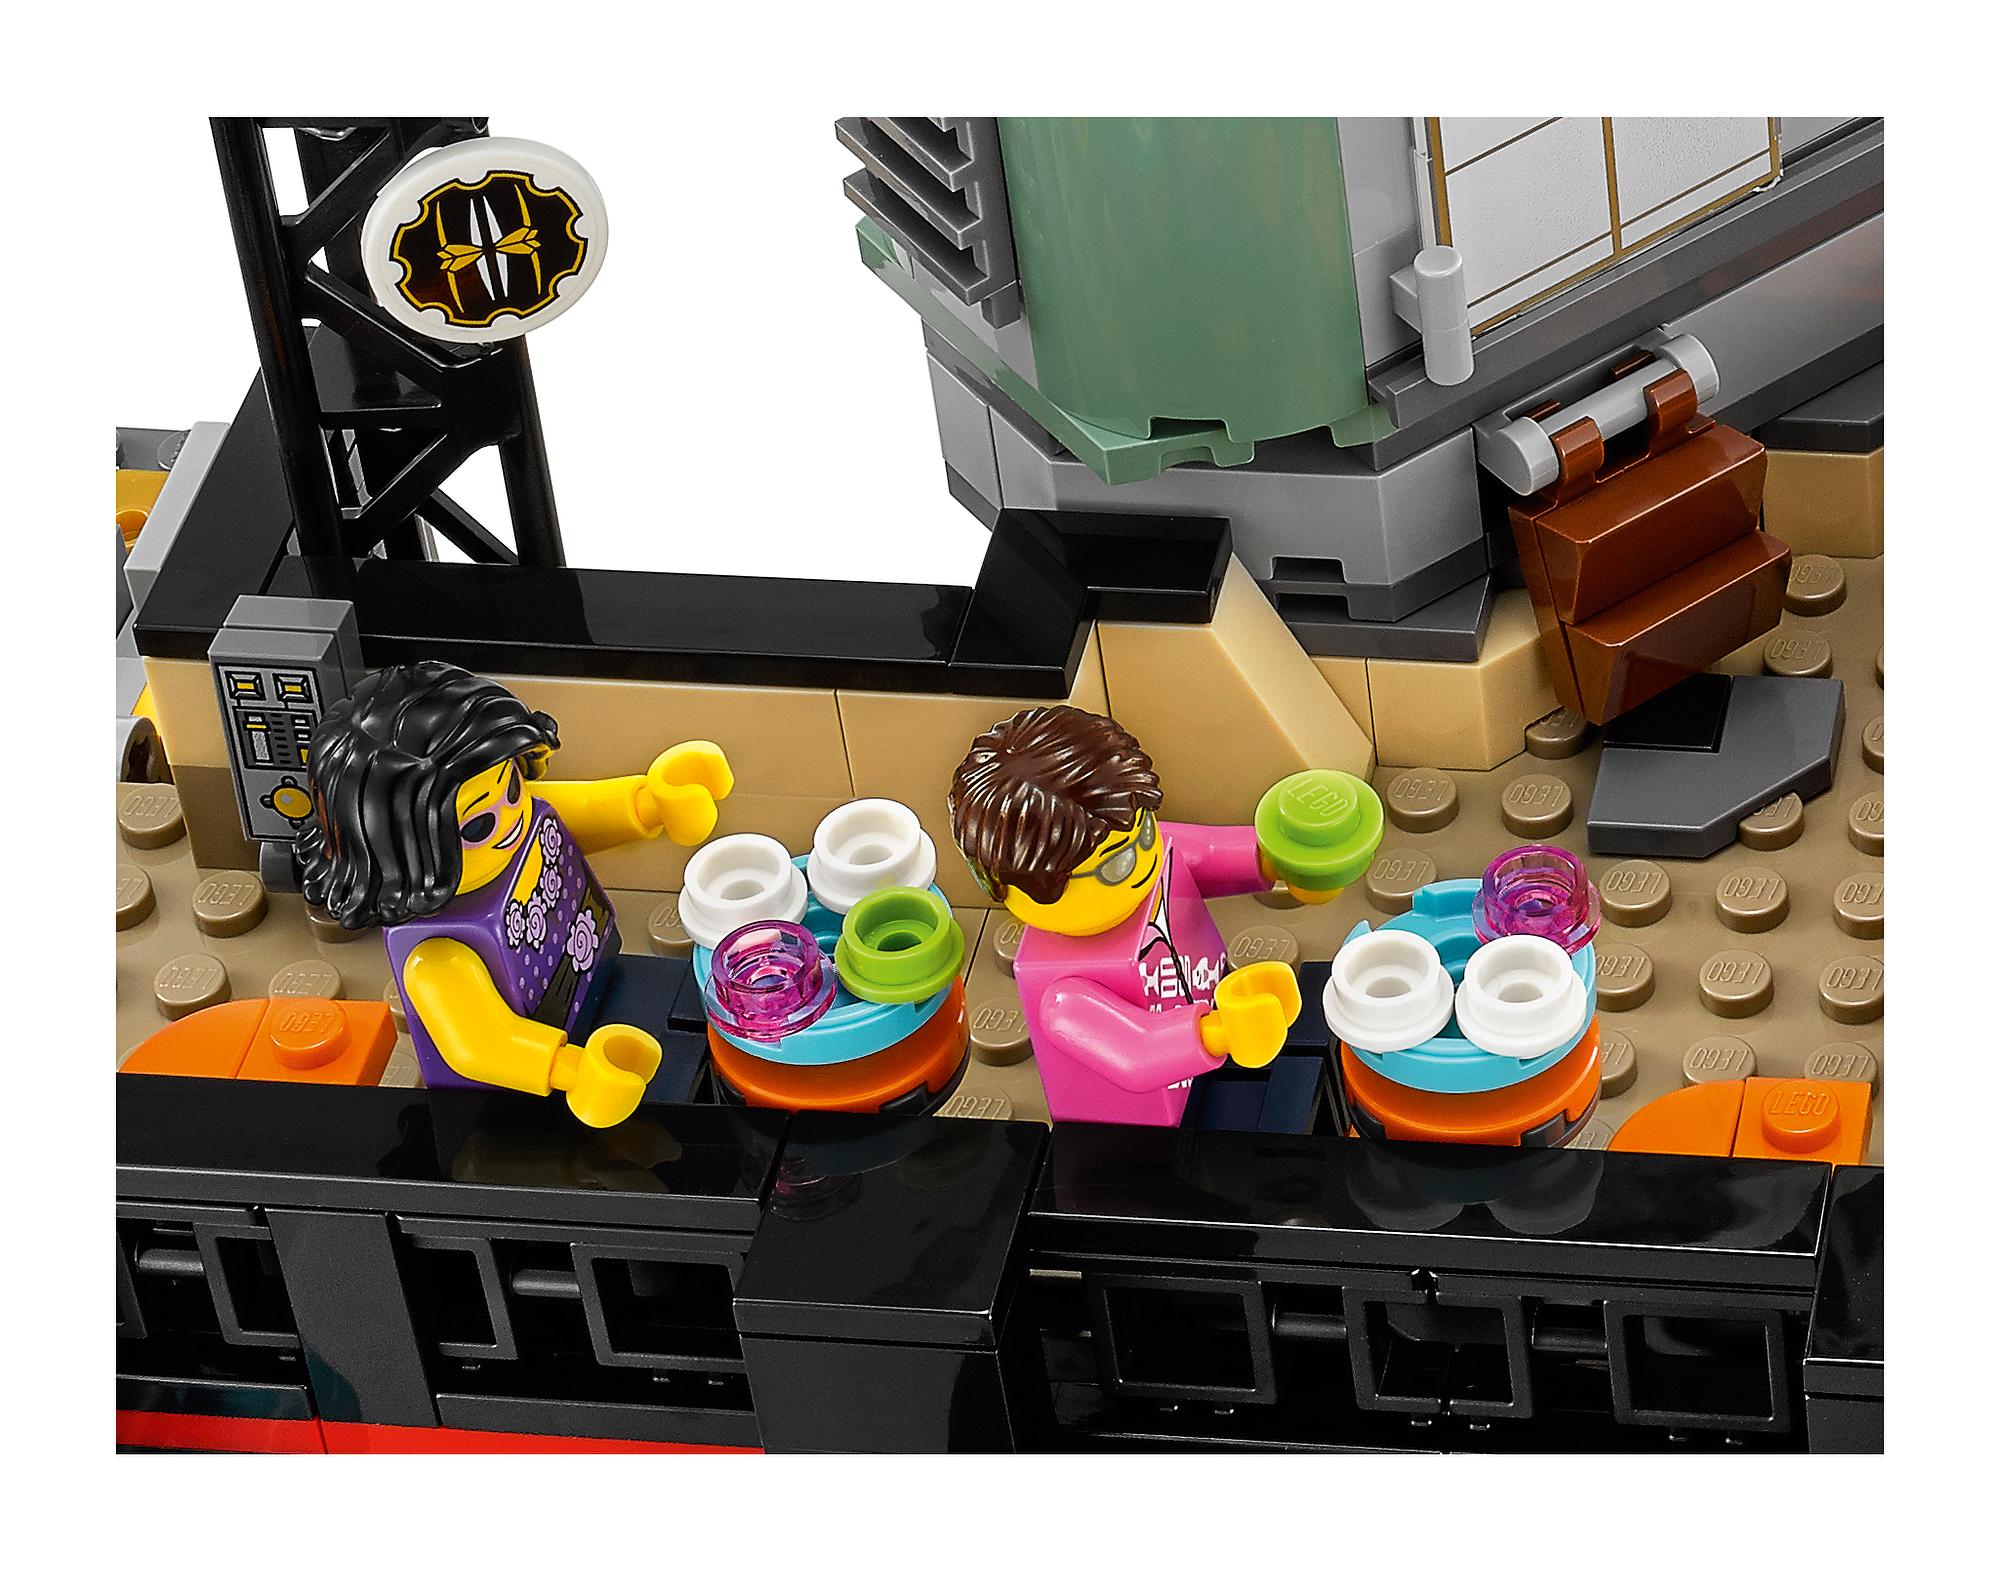 LEGO reveals 70620 Ninjago City, the massive modular ...